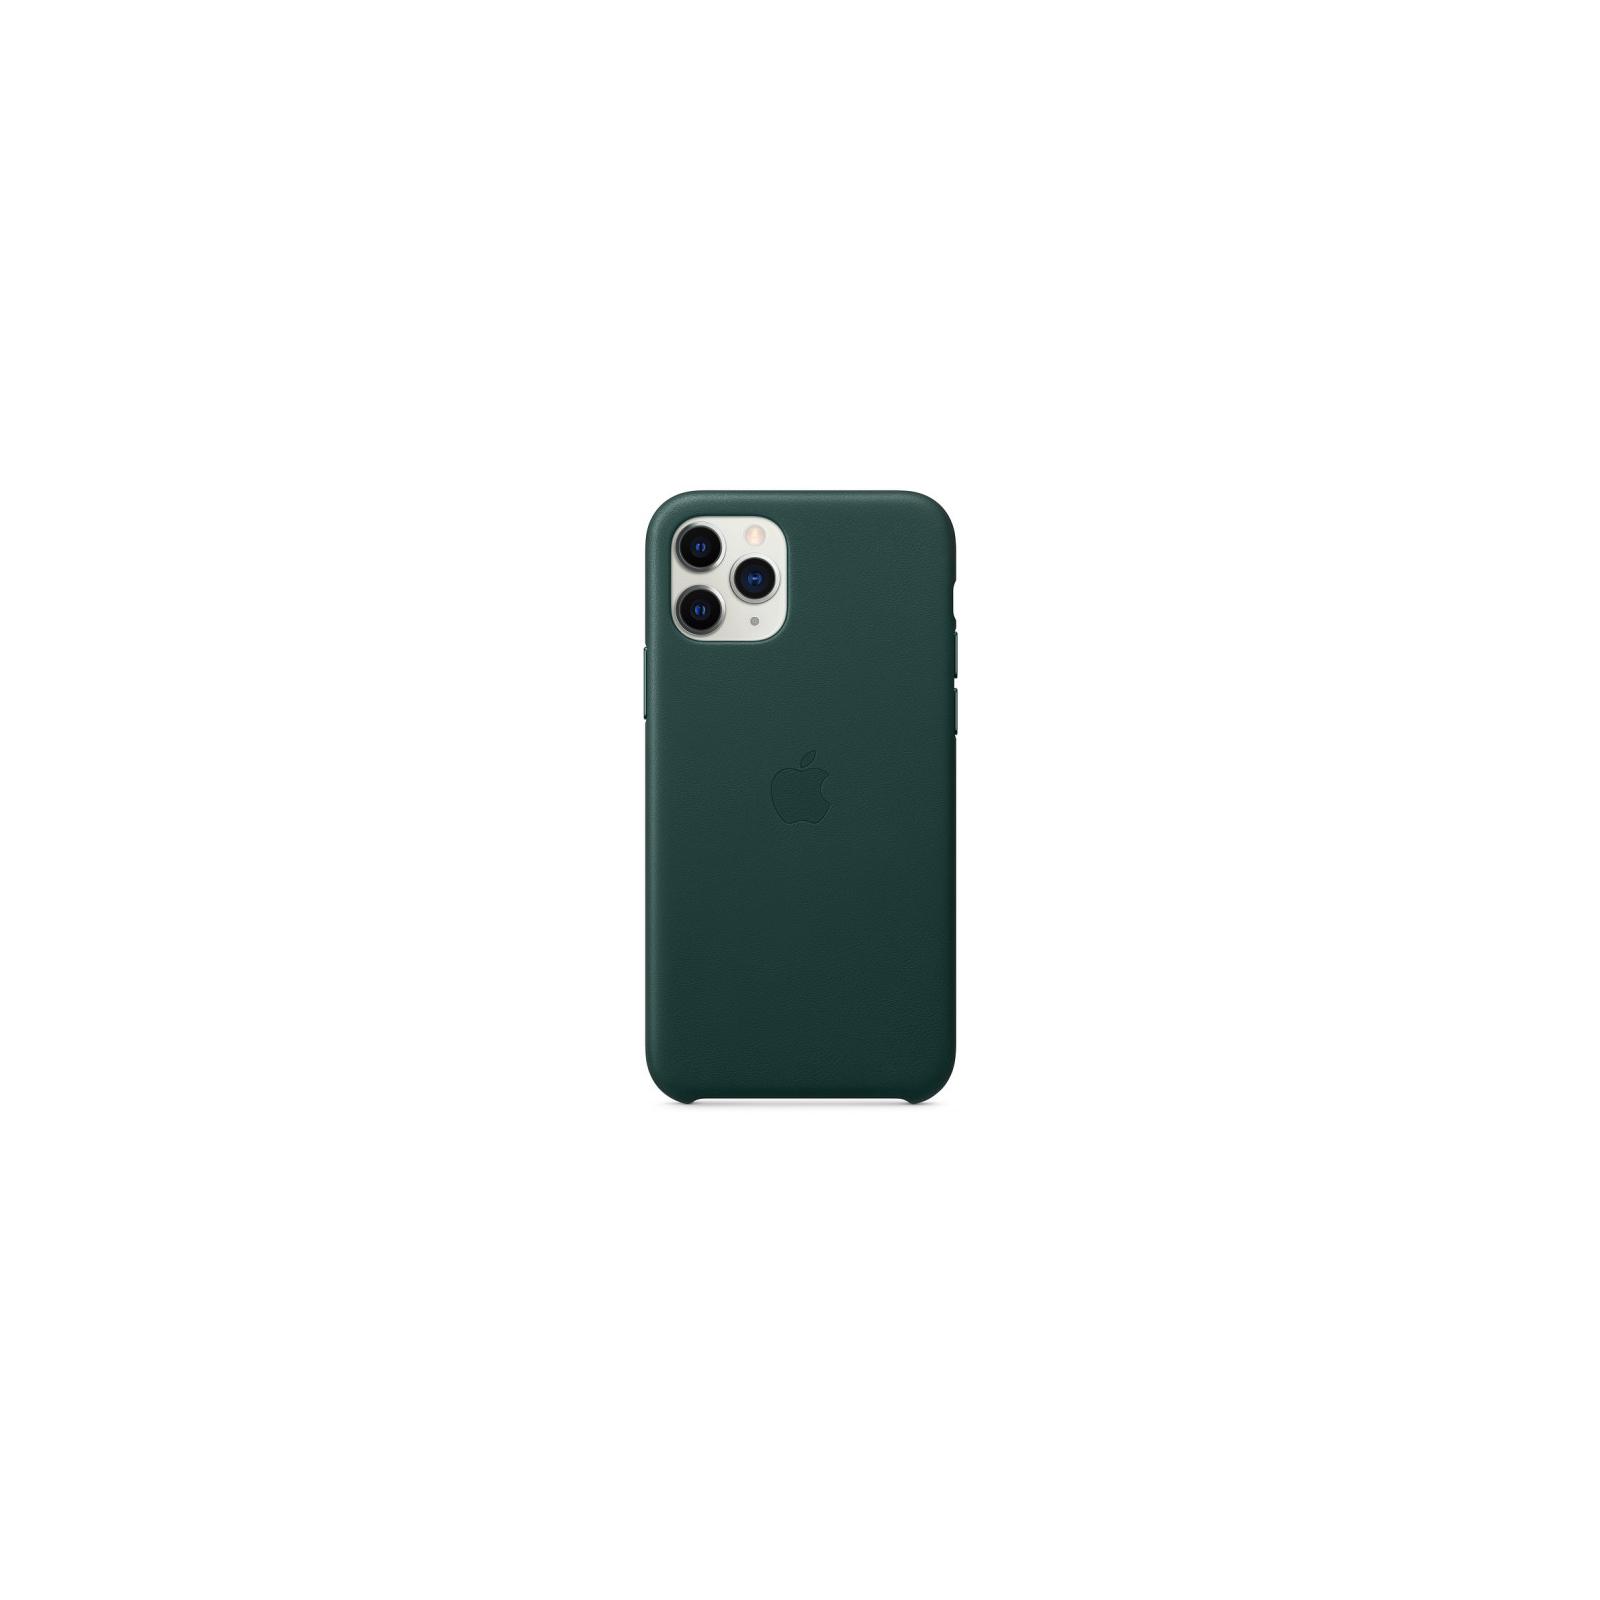 Чехол для моб. телефона Apple iPhone 11 Pro Leather Case - Midnight Blue (MWYG2ZM/A) изображение 2